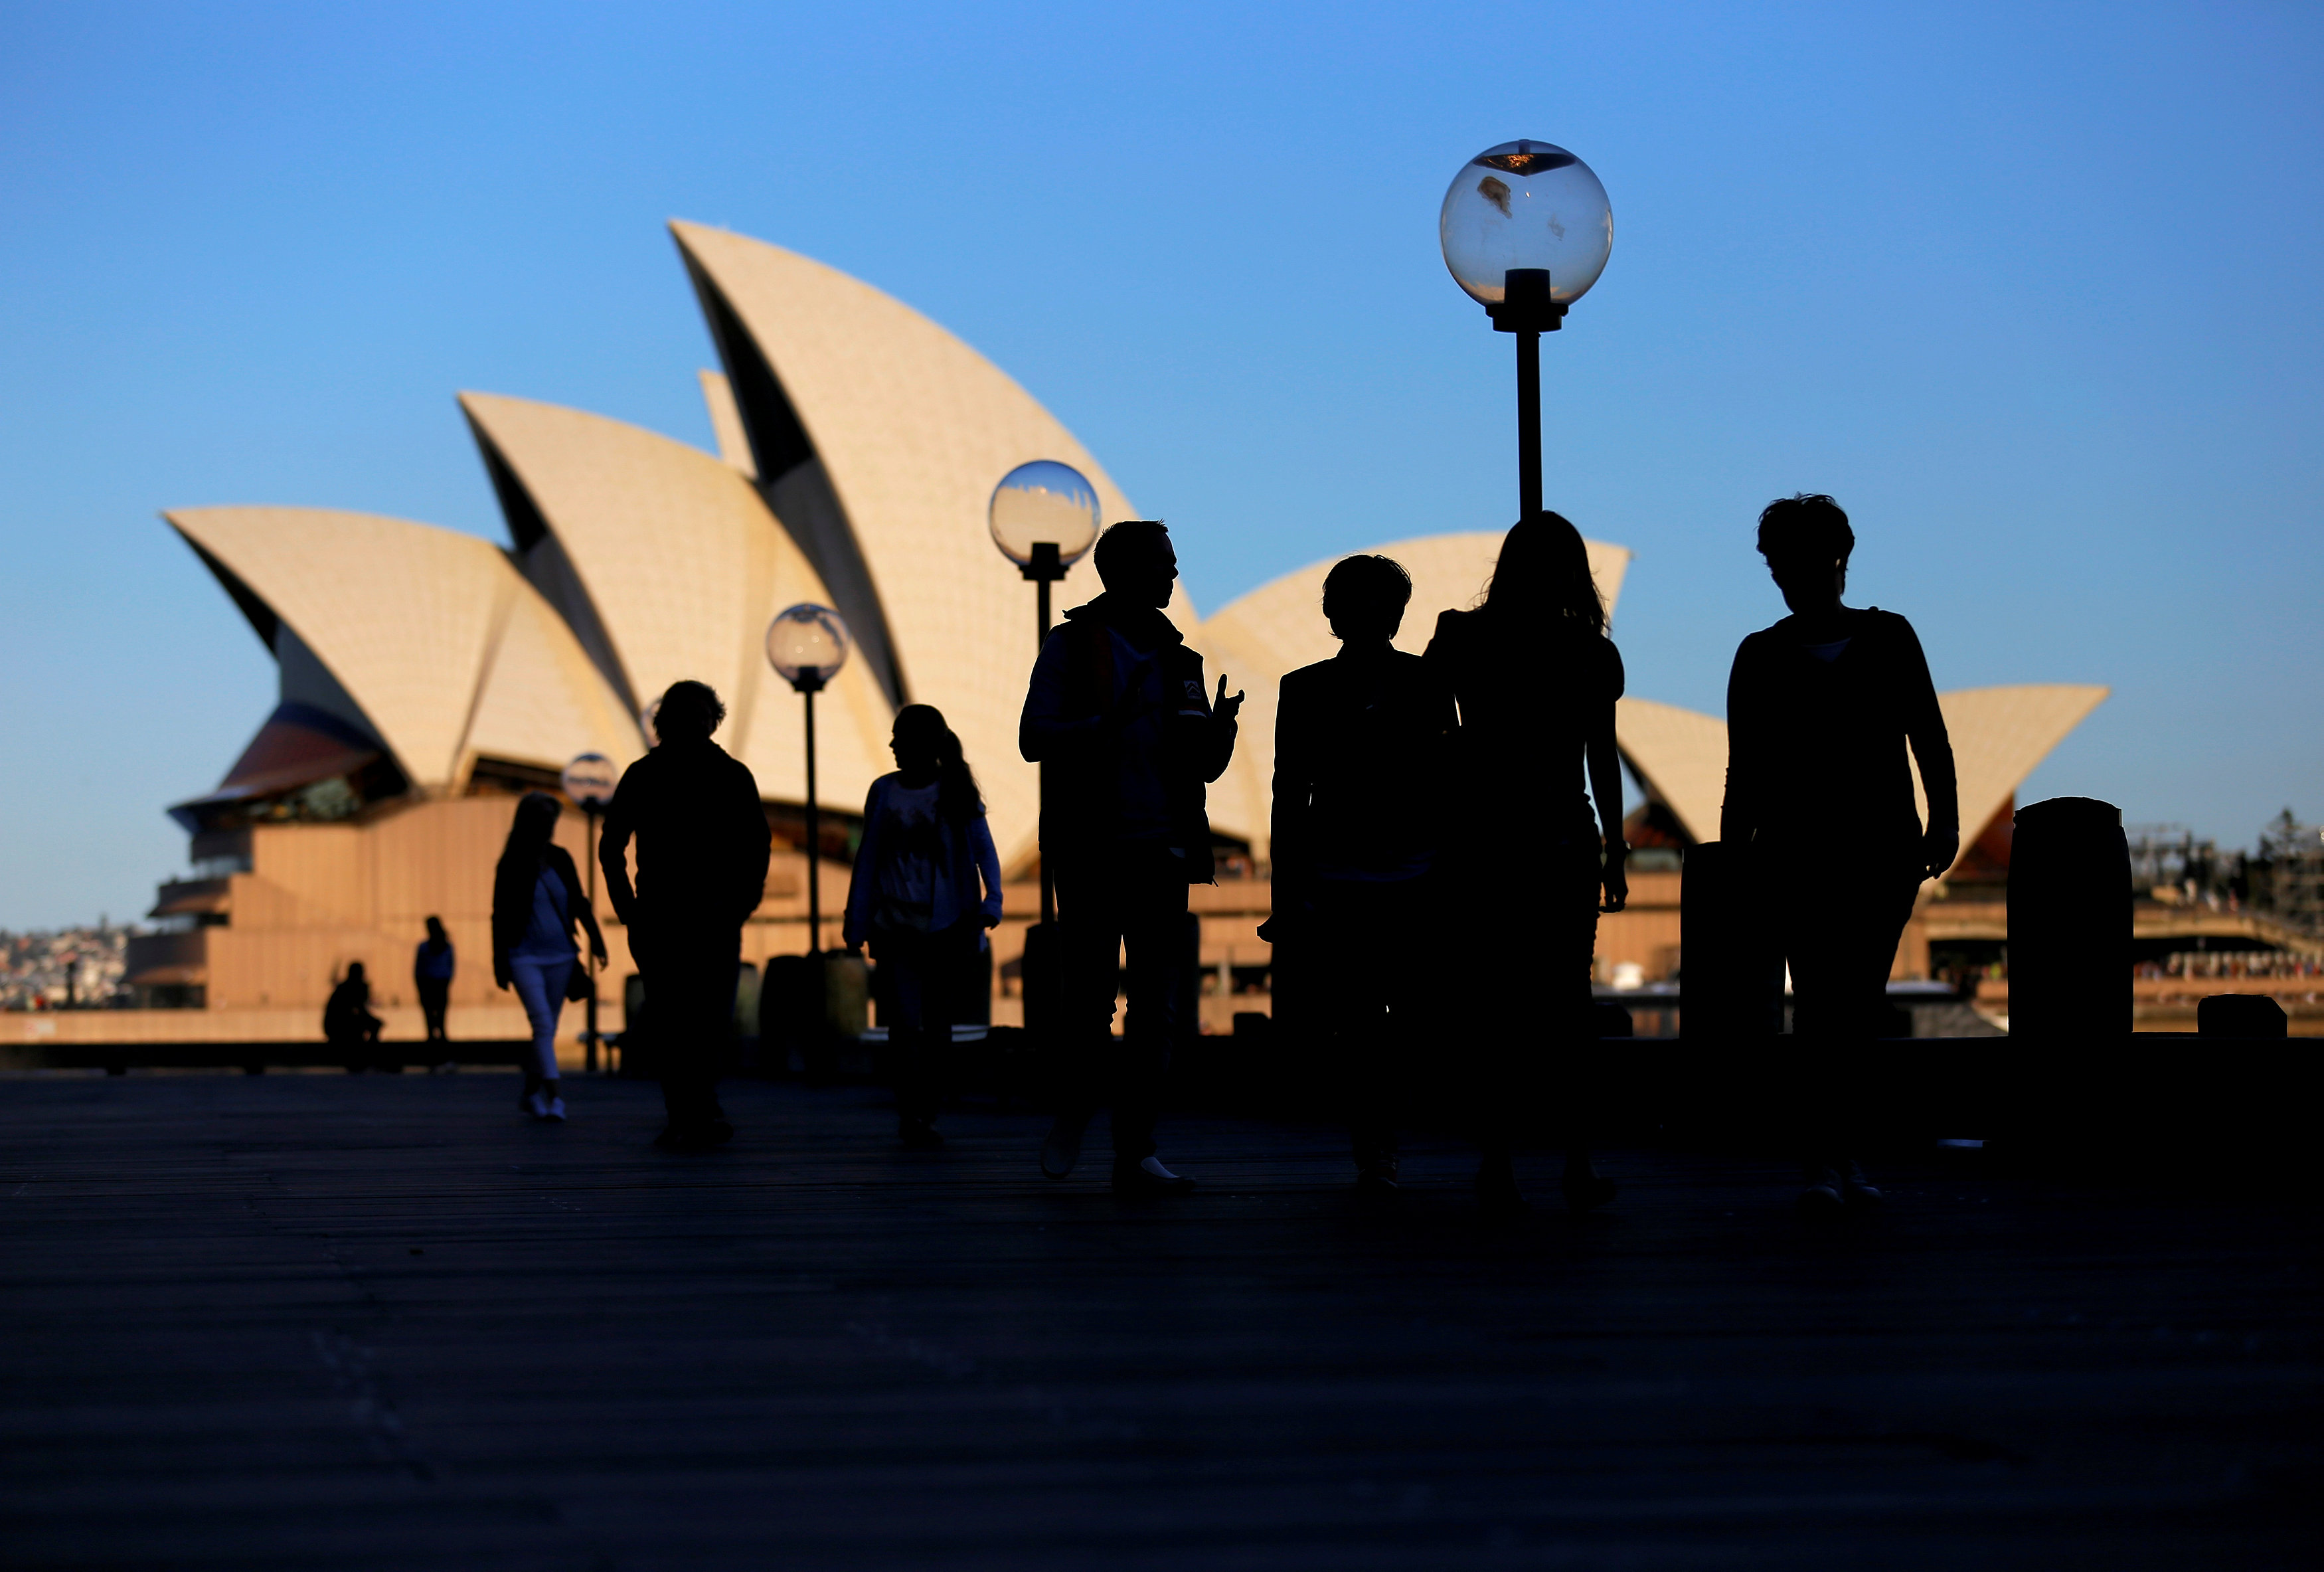 People walk in front of the Sydney Opera House, Australia on Nov. 2, 2016. (REUTERS/Steven Saphore)